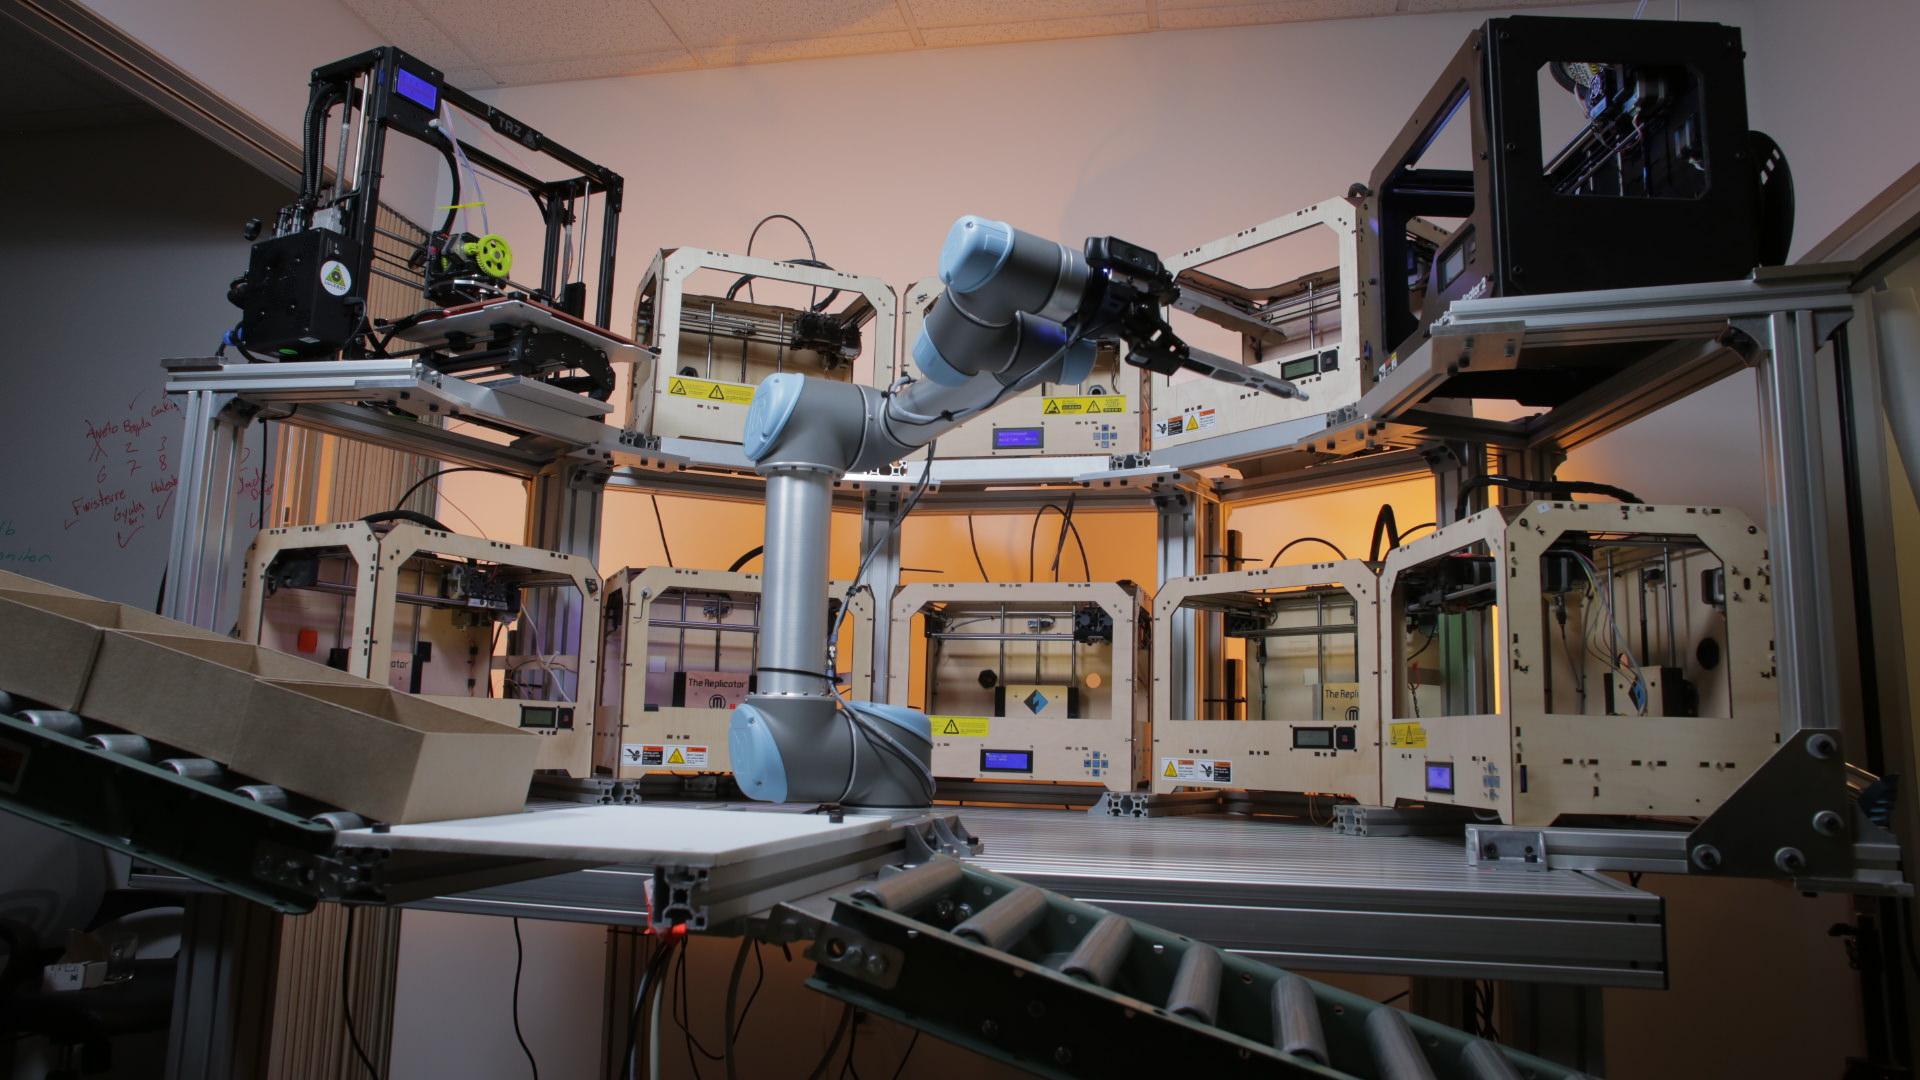 tend-ai-robot_and_3D_printers-1